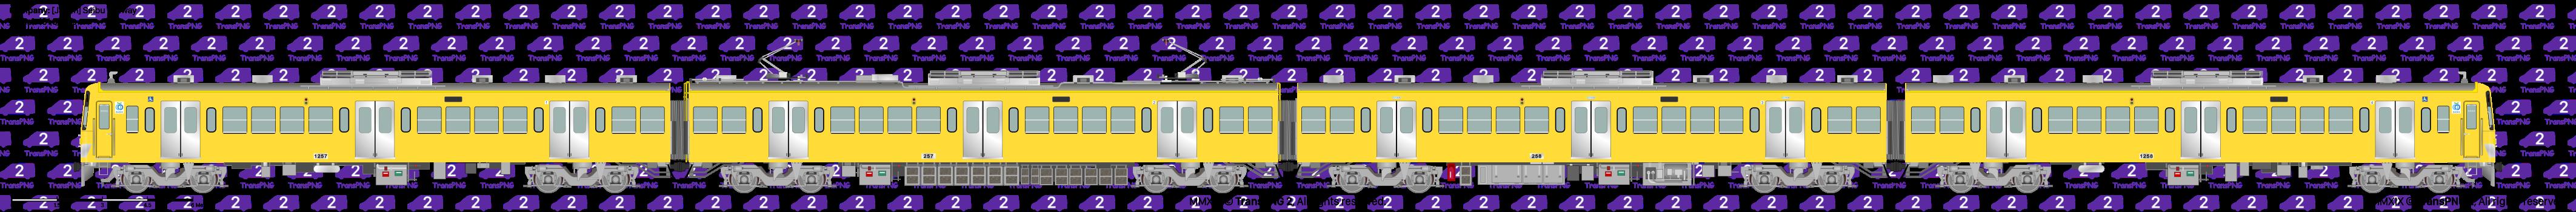 [24008] Seibu Railway 24008